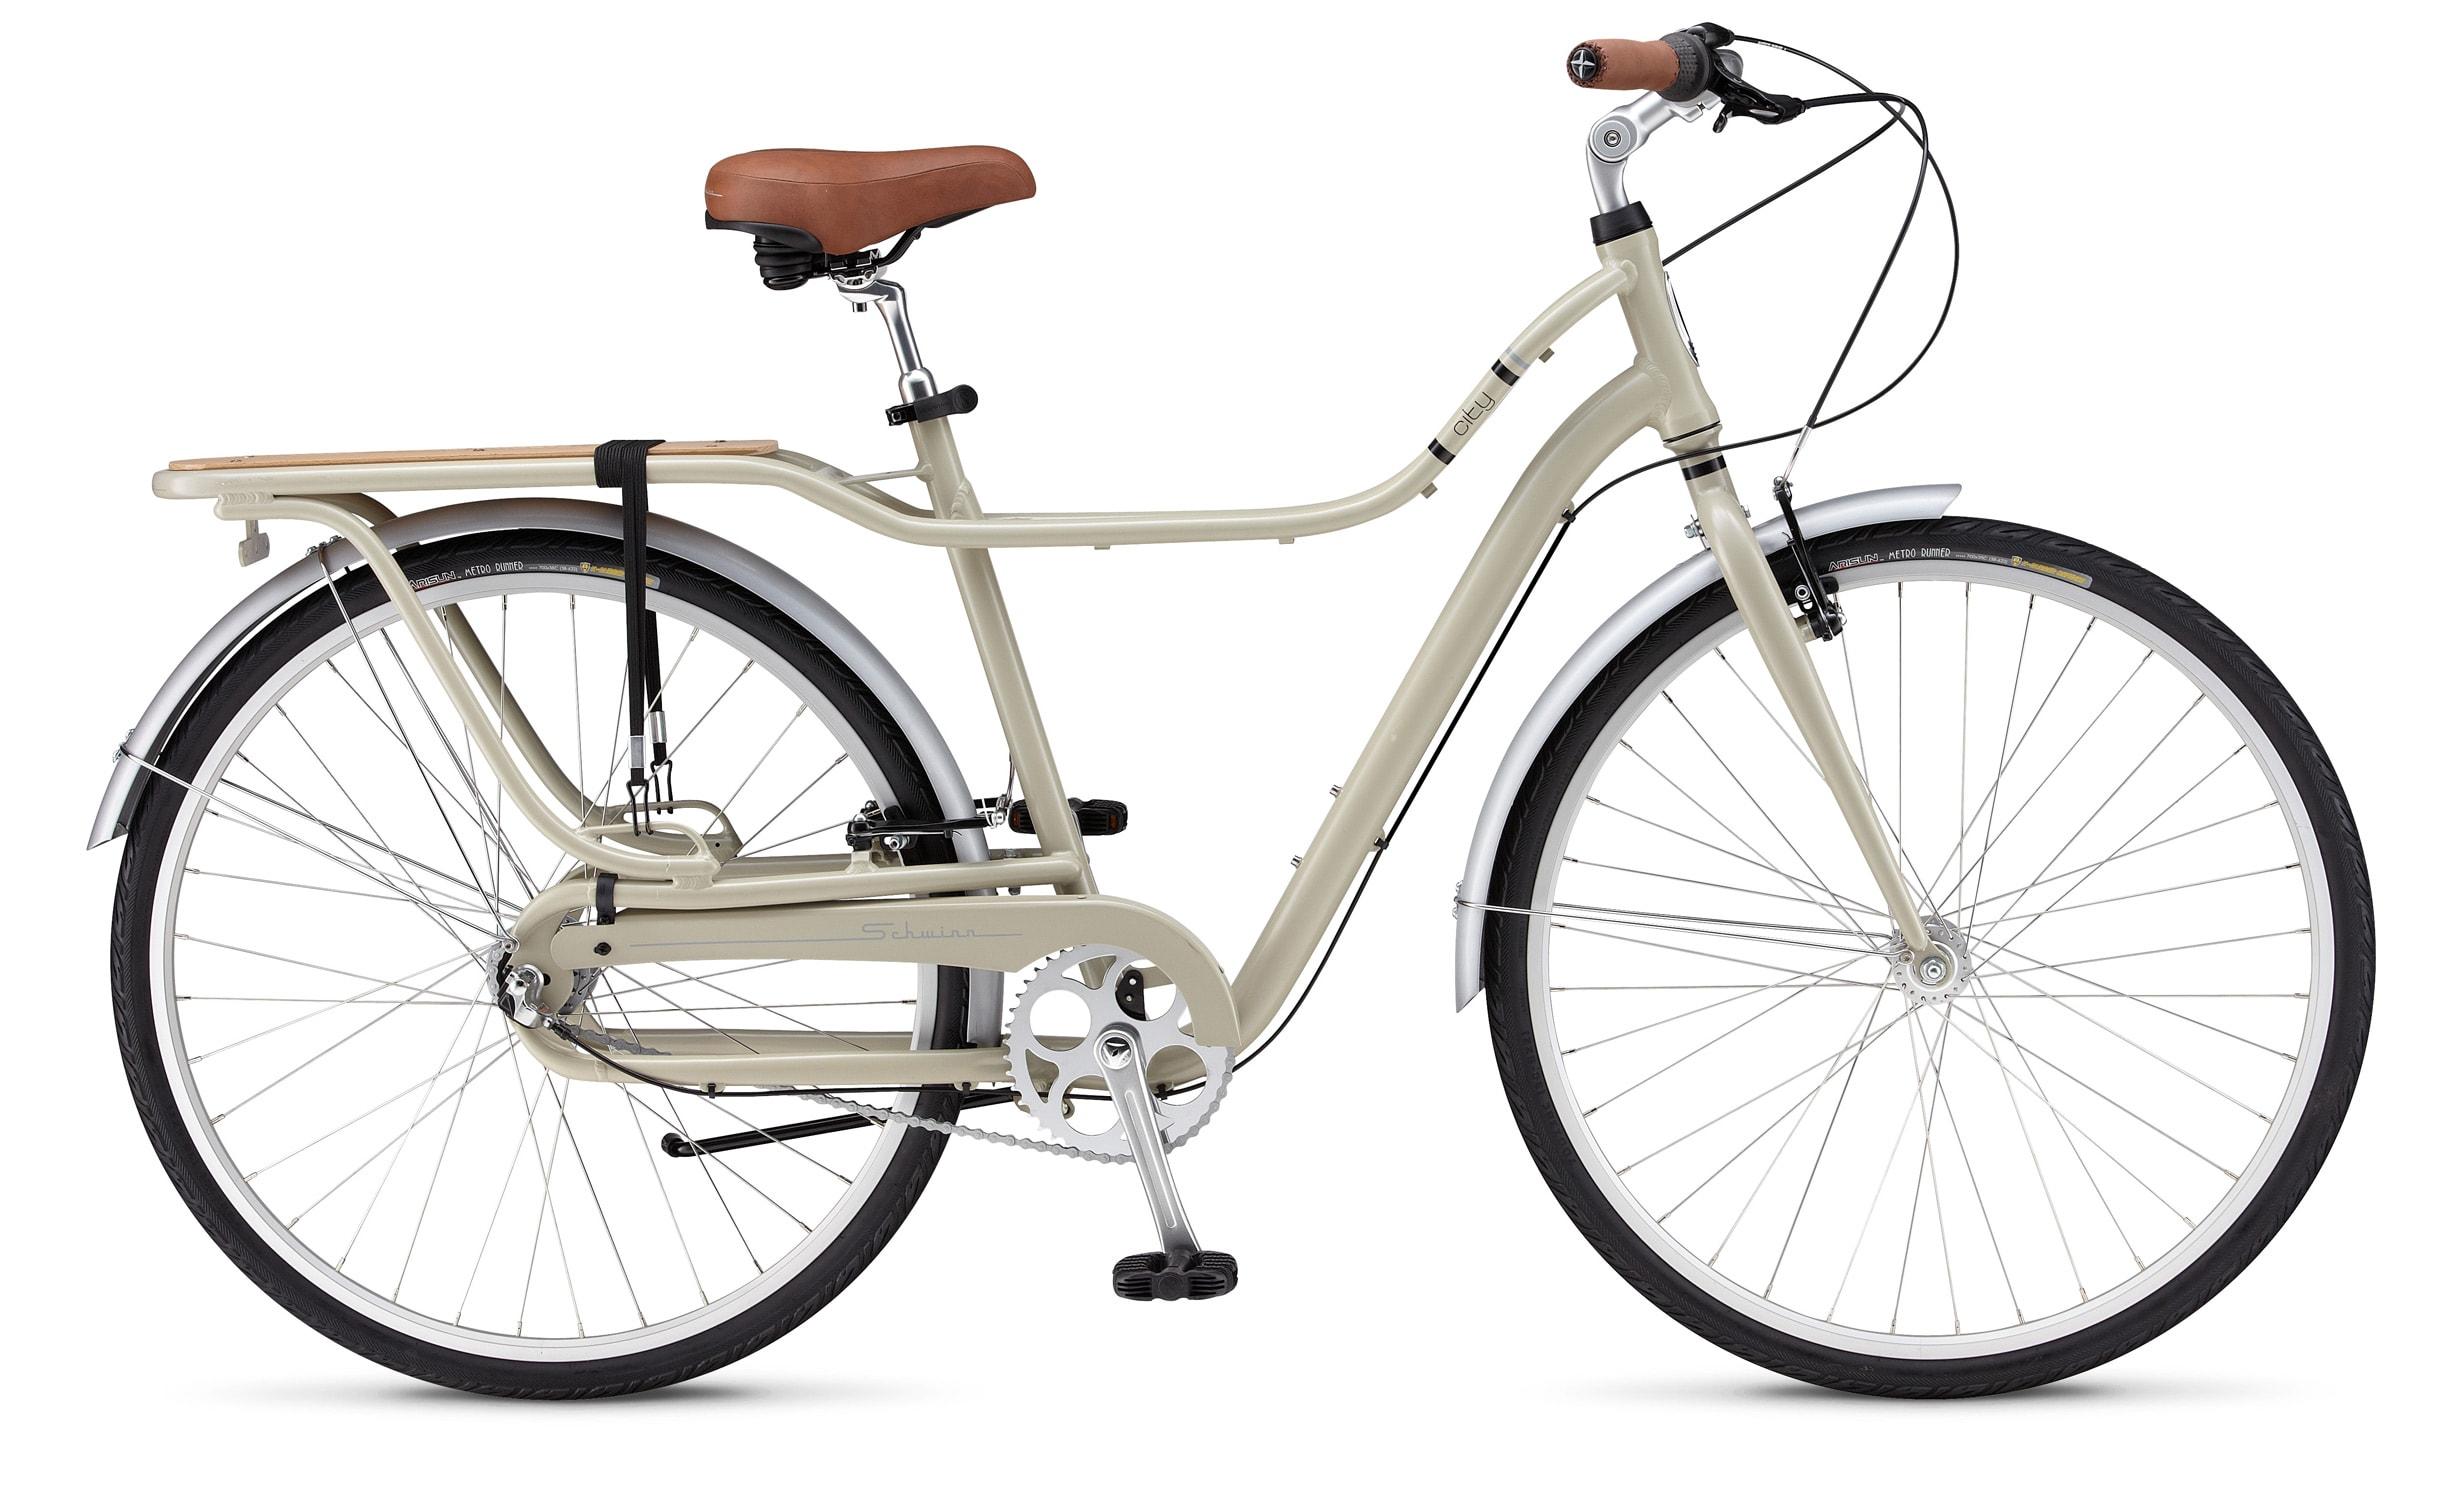 On Sale Schwinn City 2 Bike up to 55% off